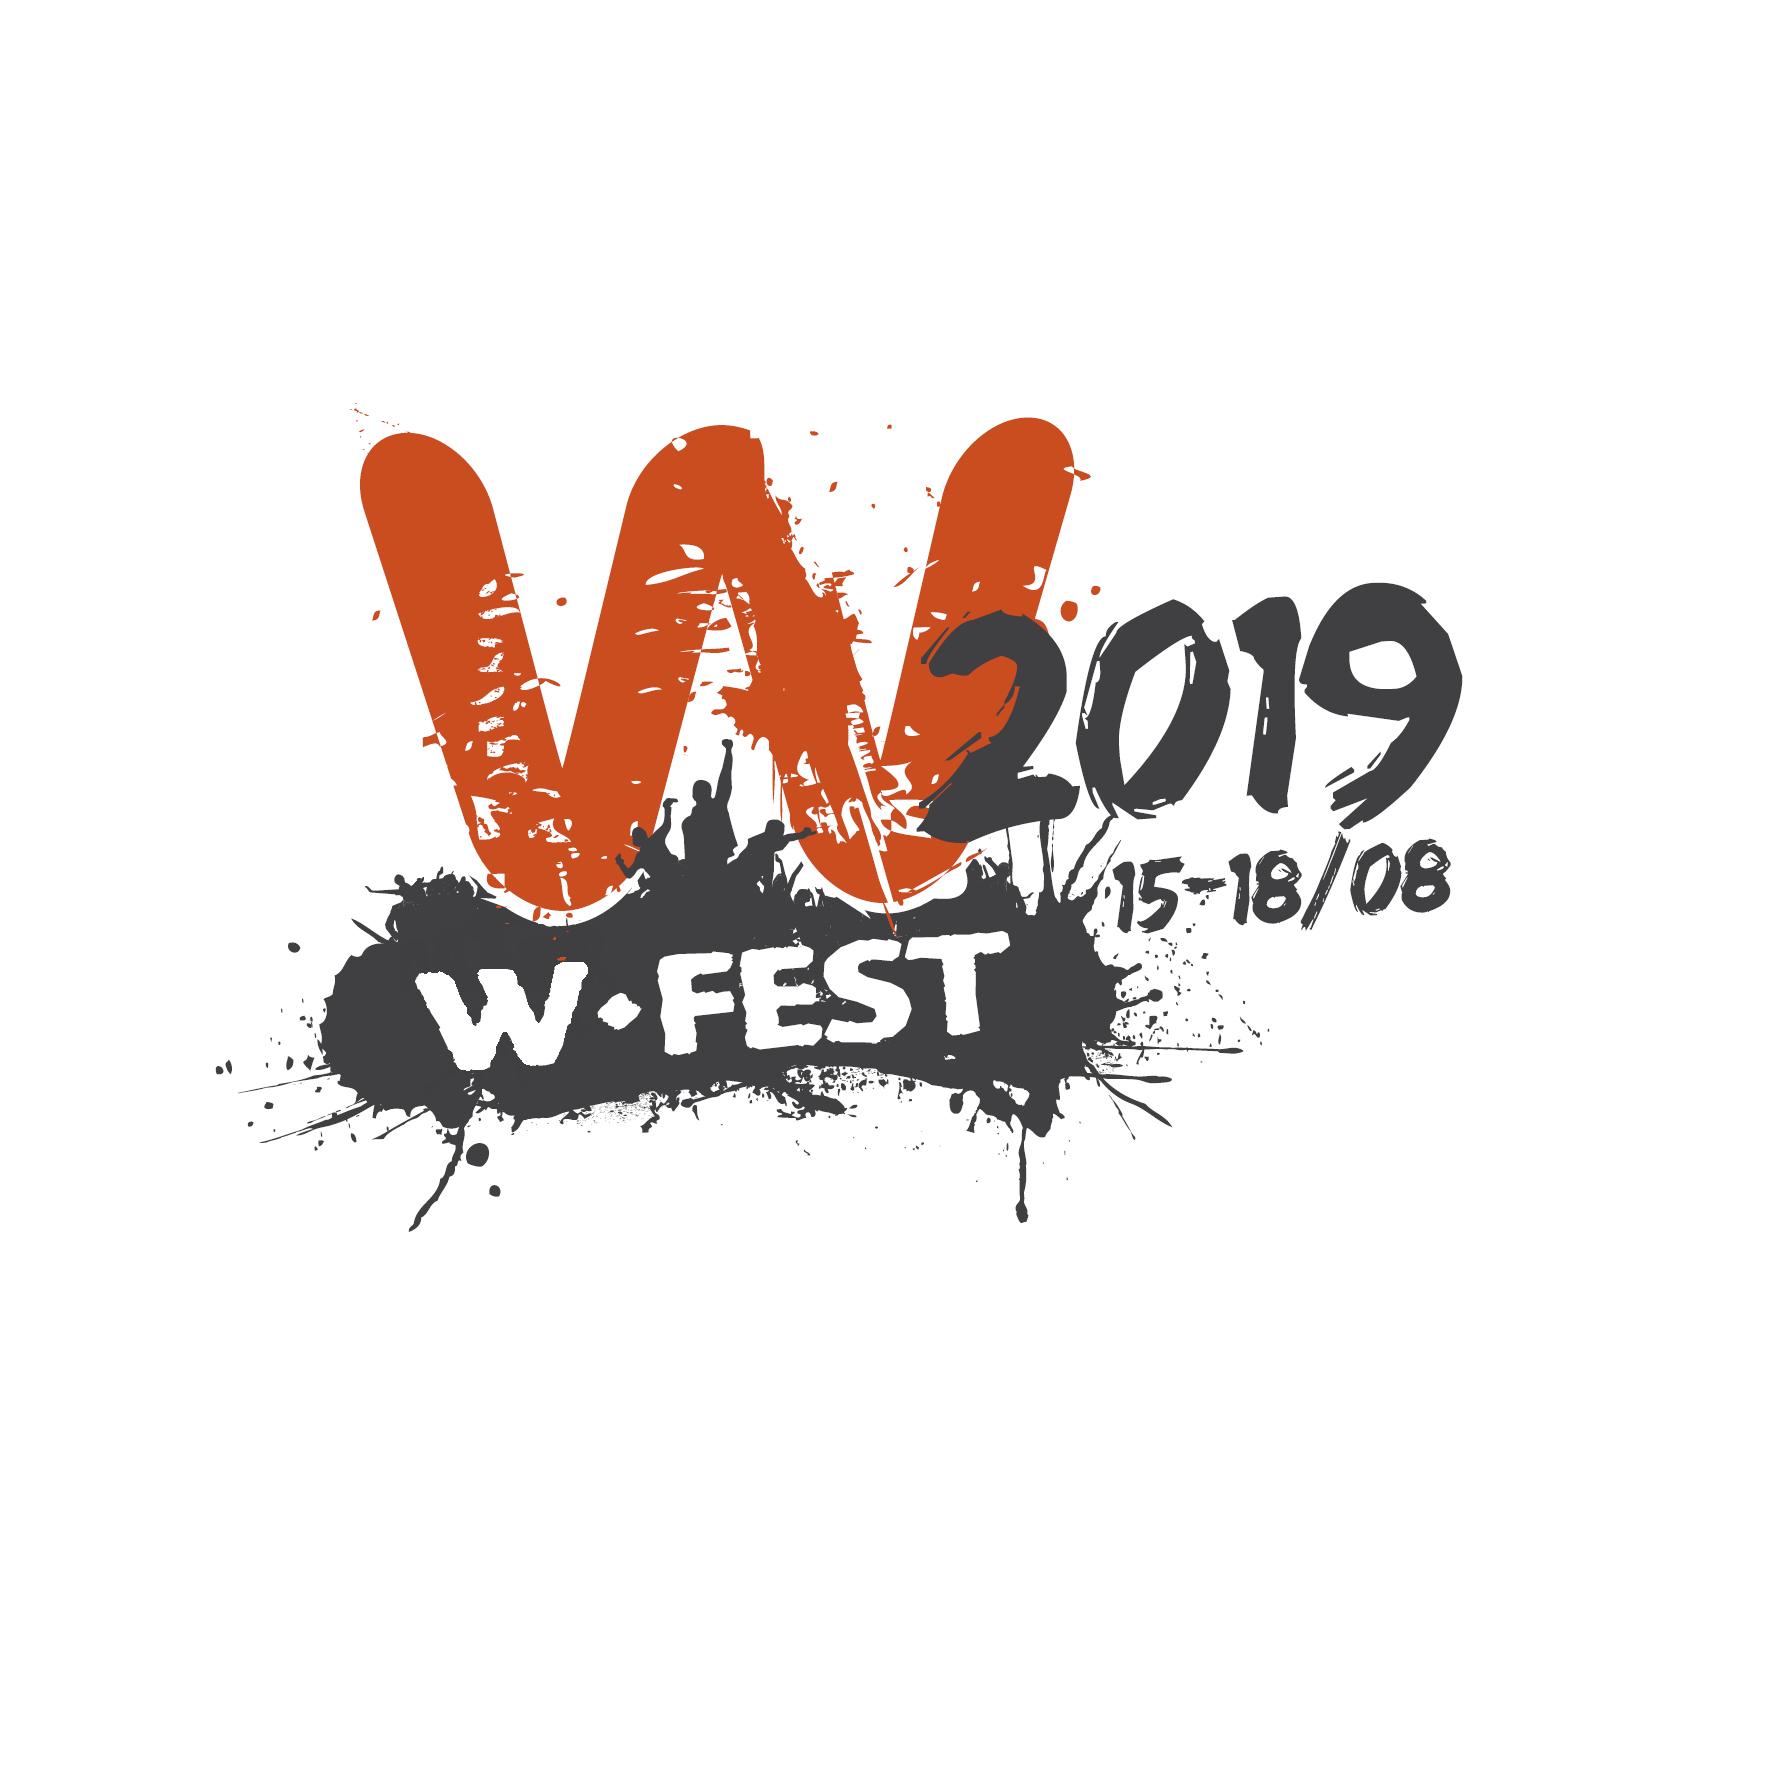 W-fest2019 Logo.jpg